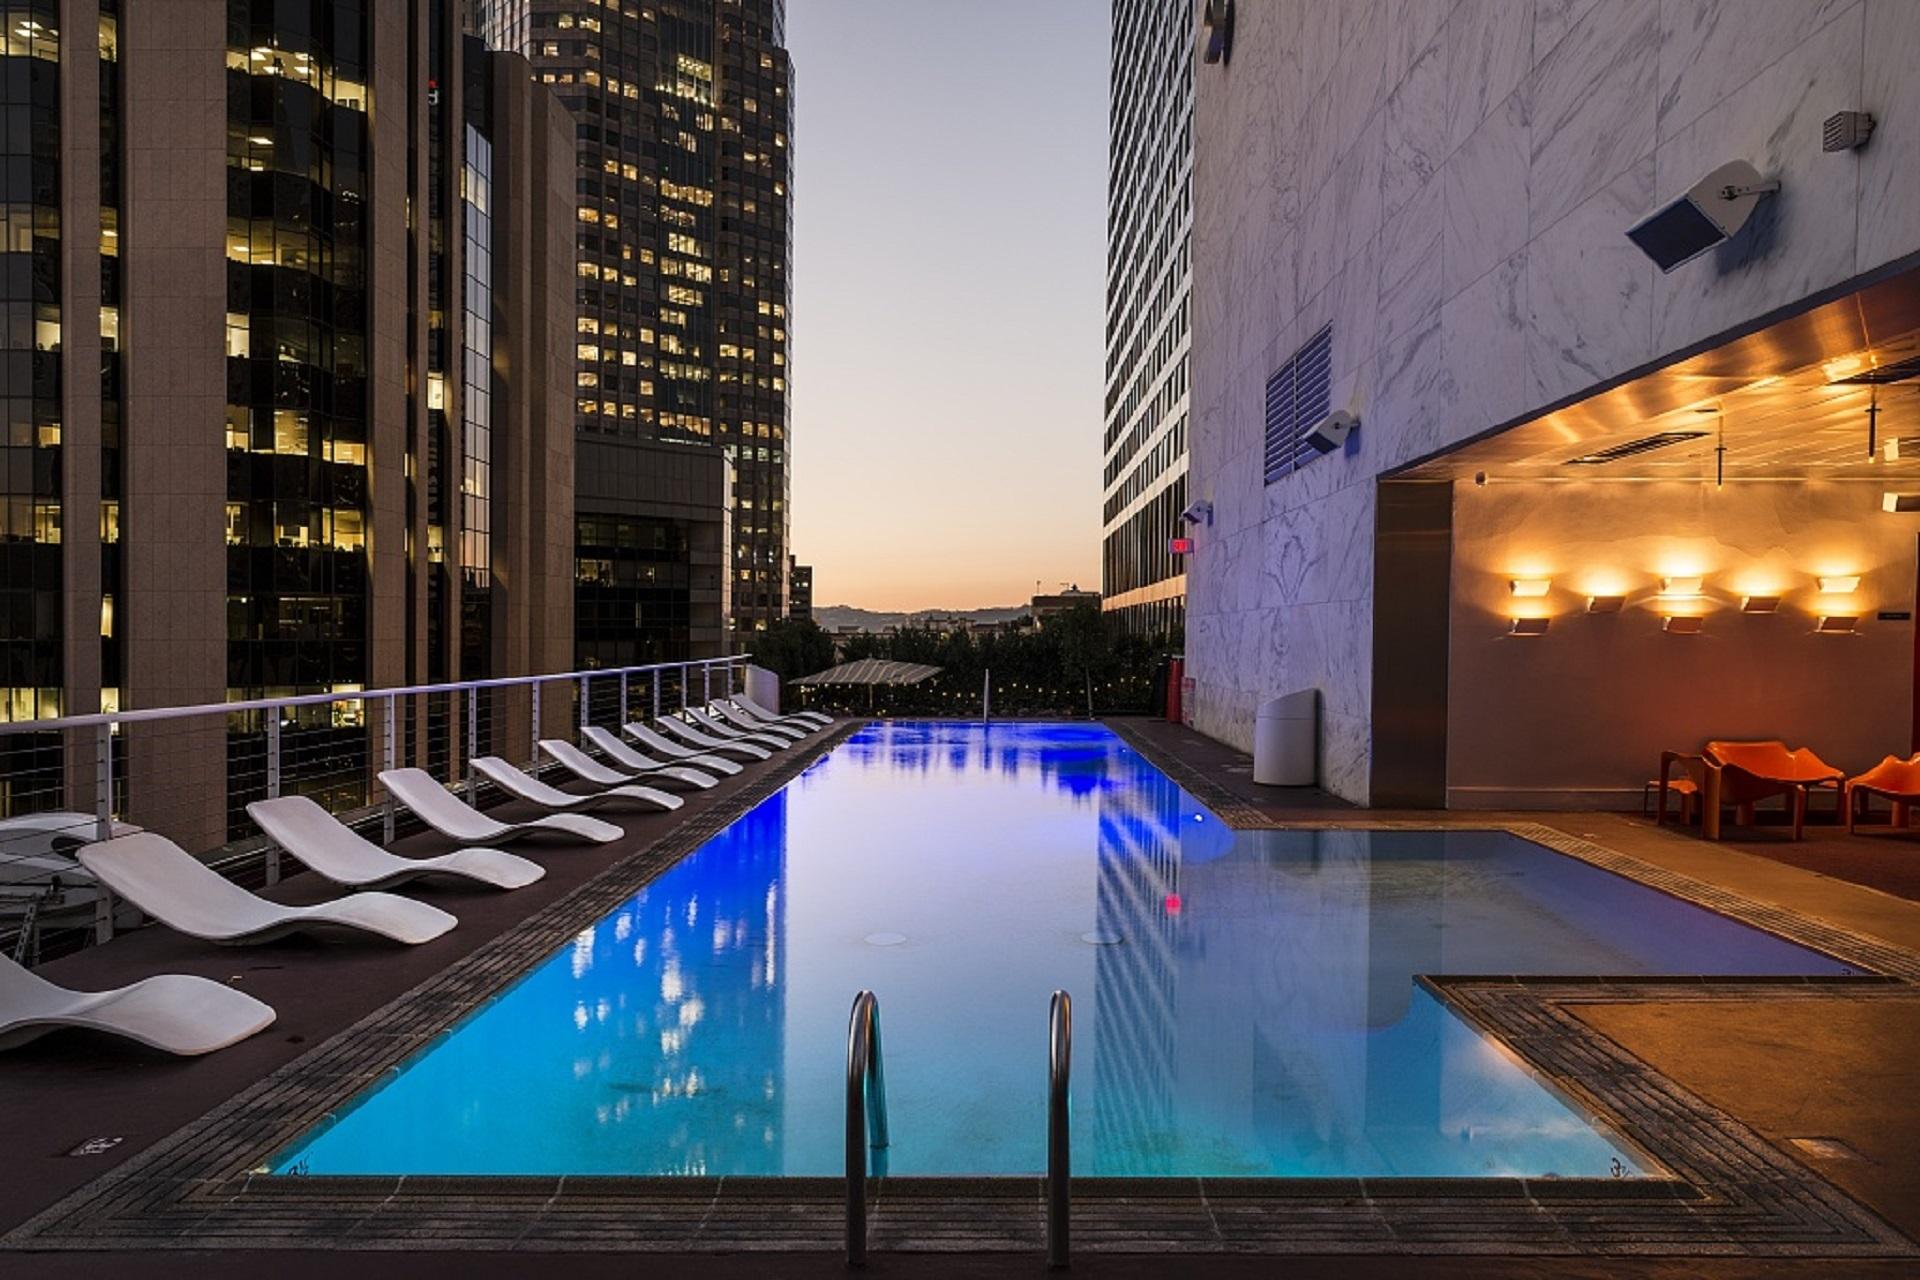 swimming pool ideas